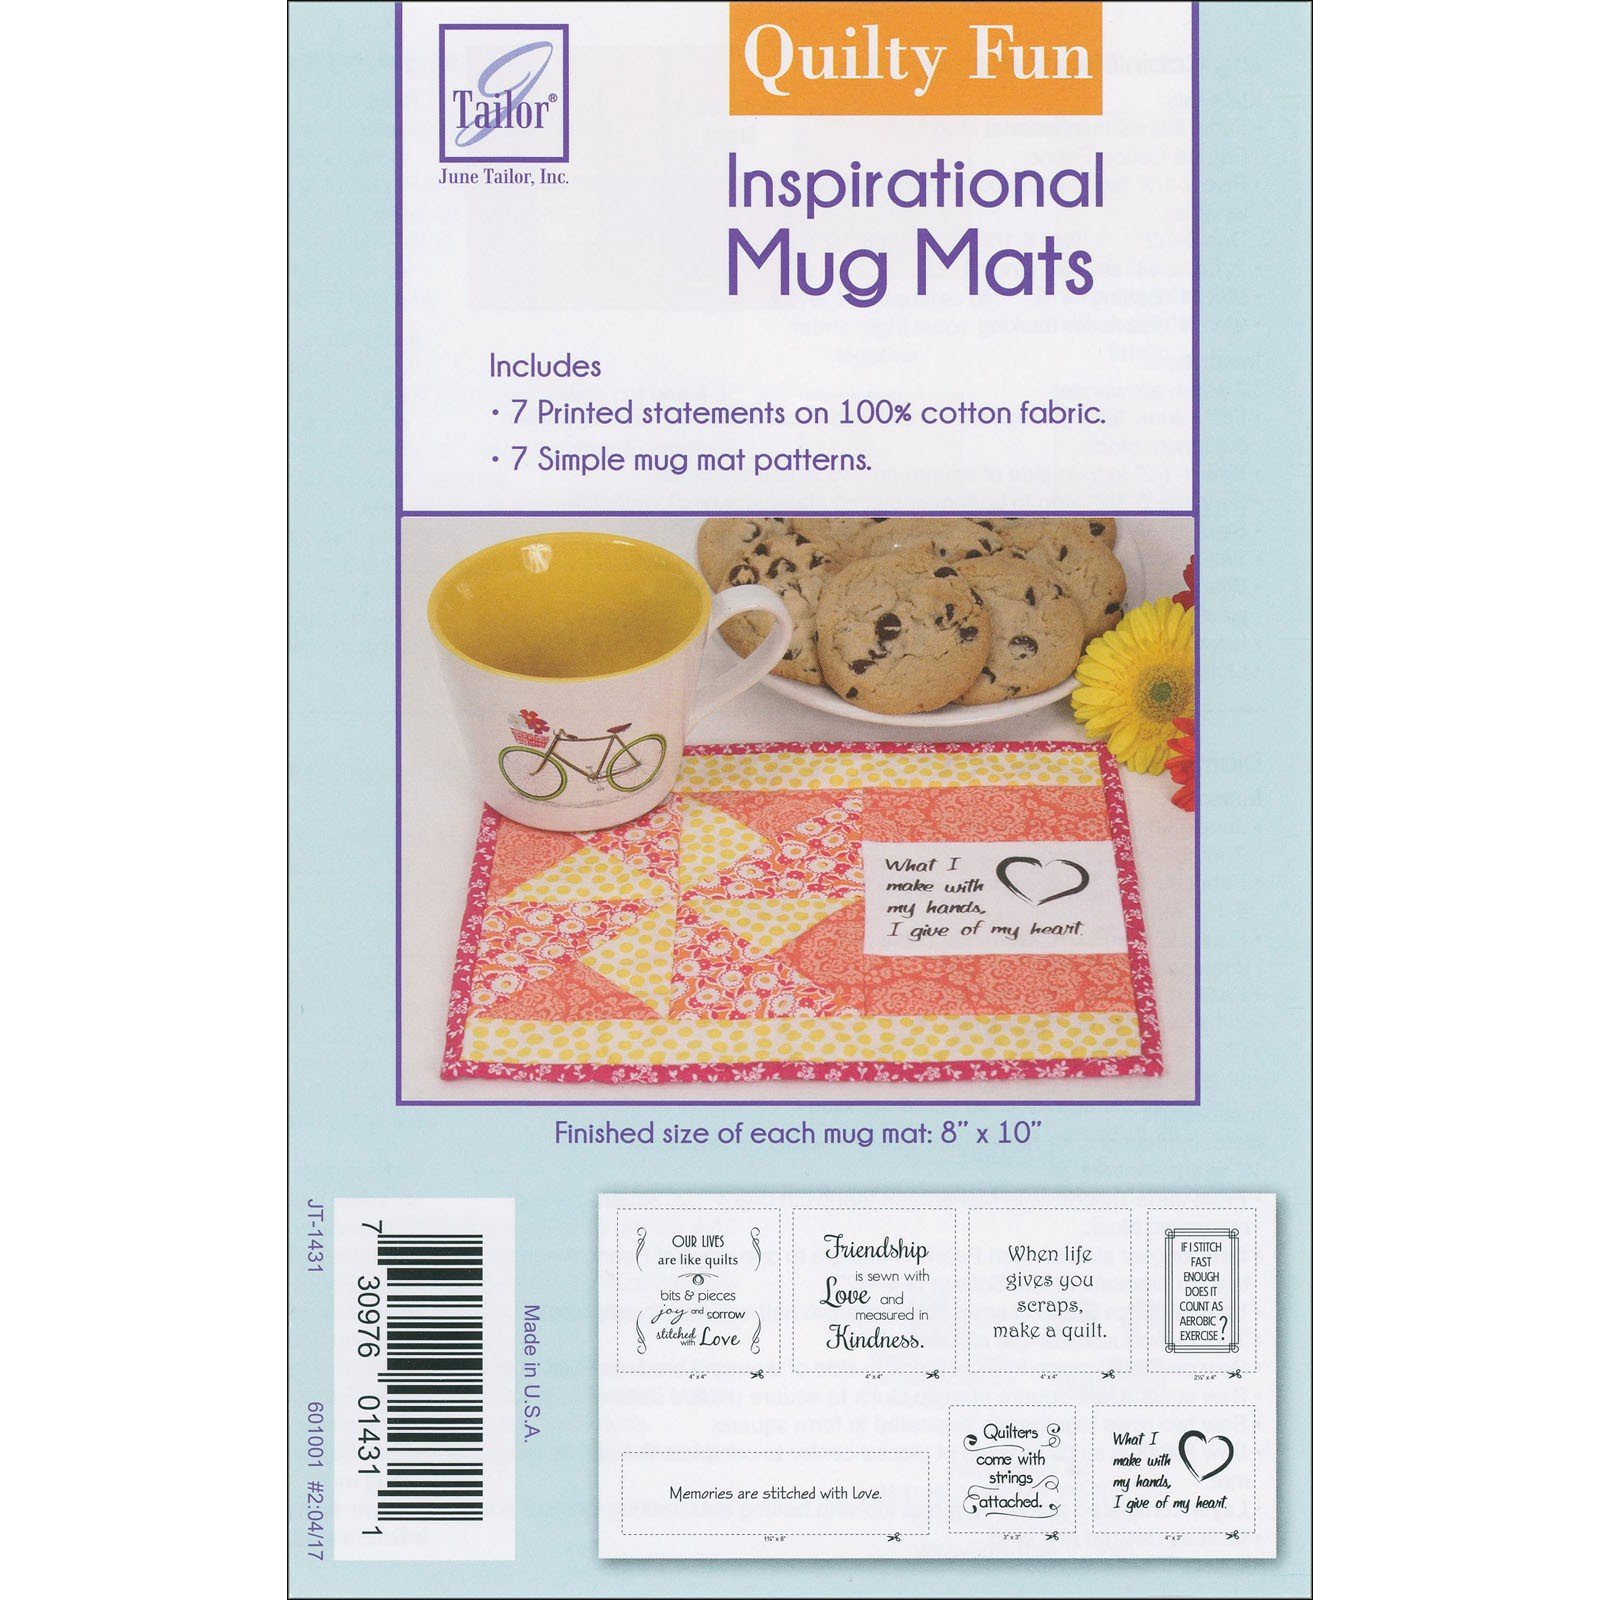 Pattern - Inspirational Mug Mats -- Quilty Fun